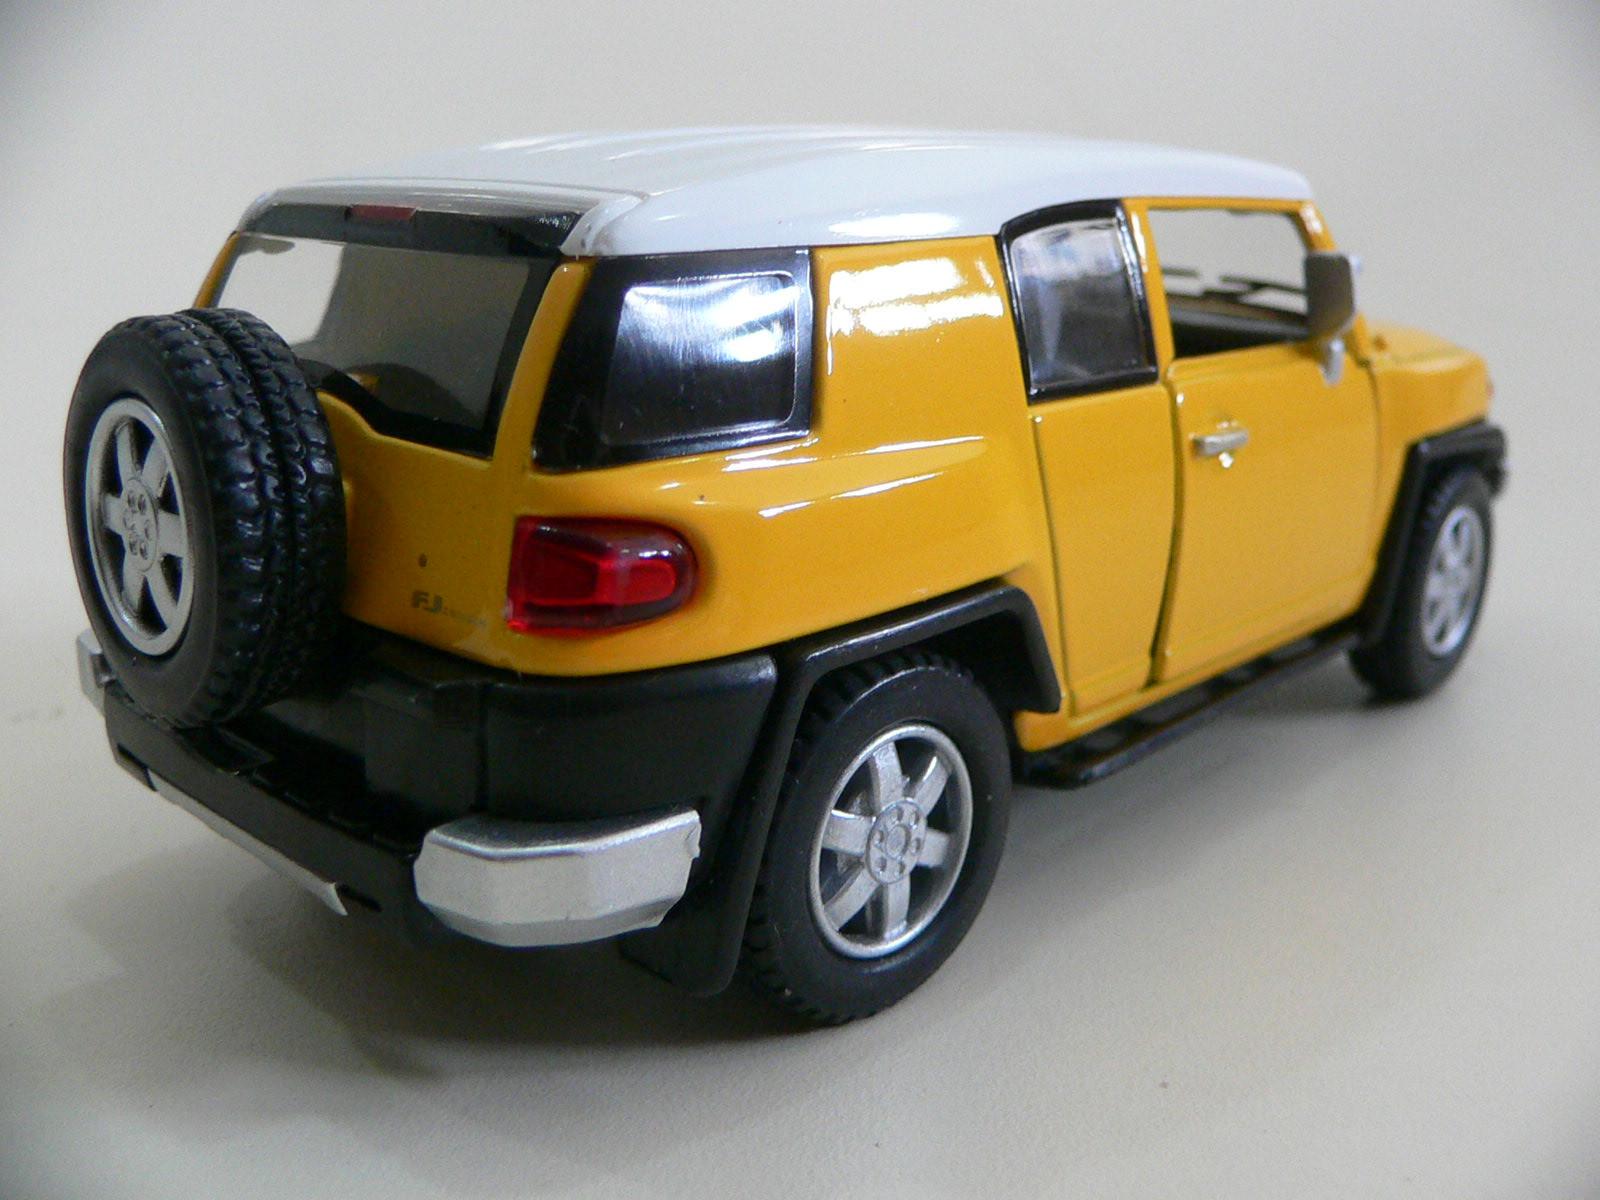 Toyota FJ Cruiser Amarela Kinsmart 1:36